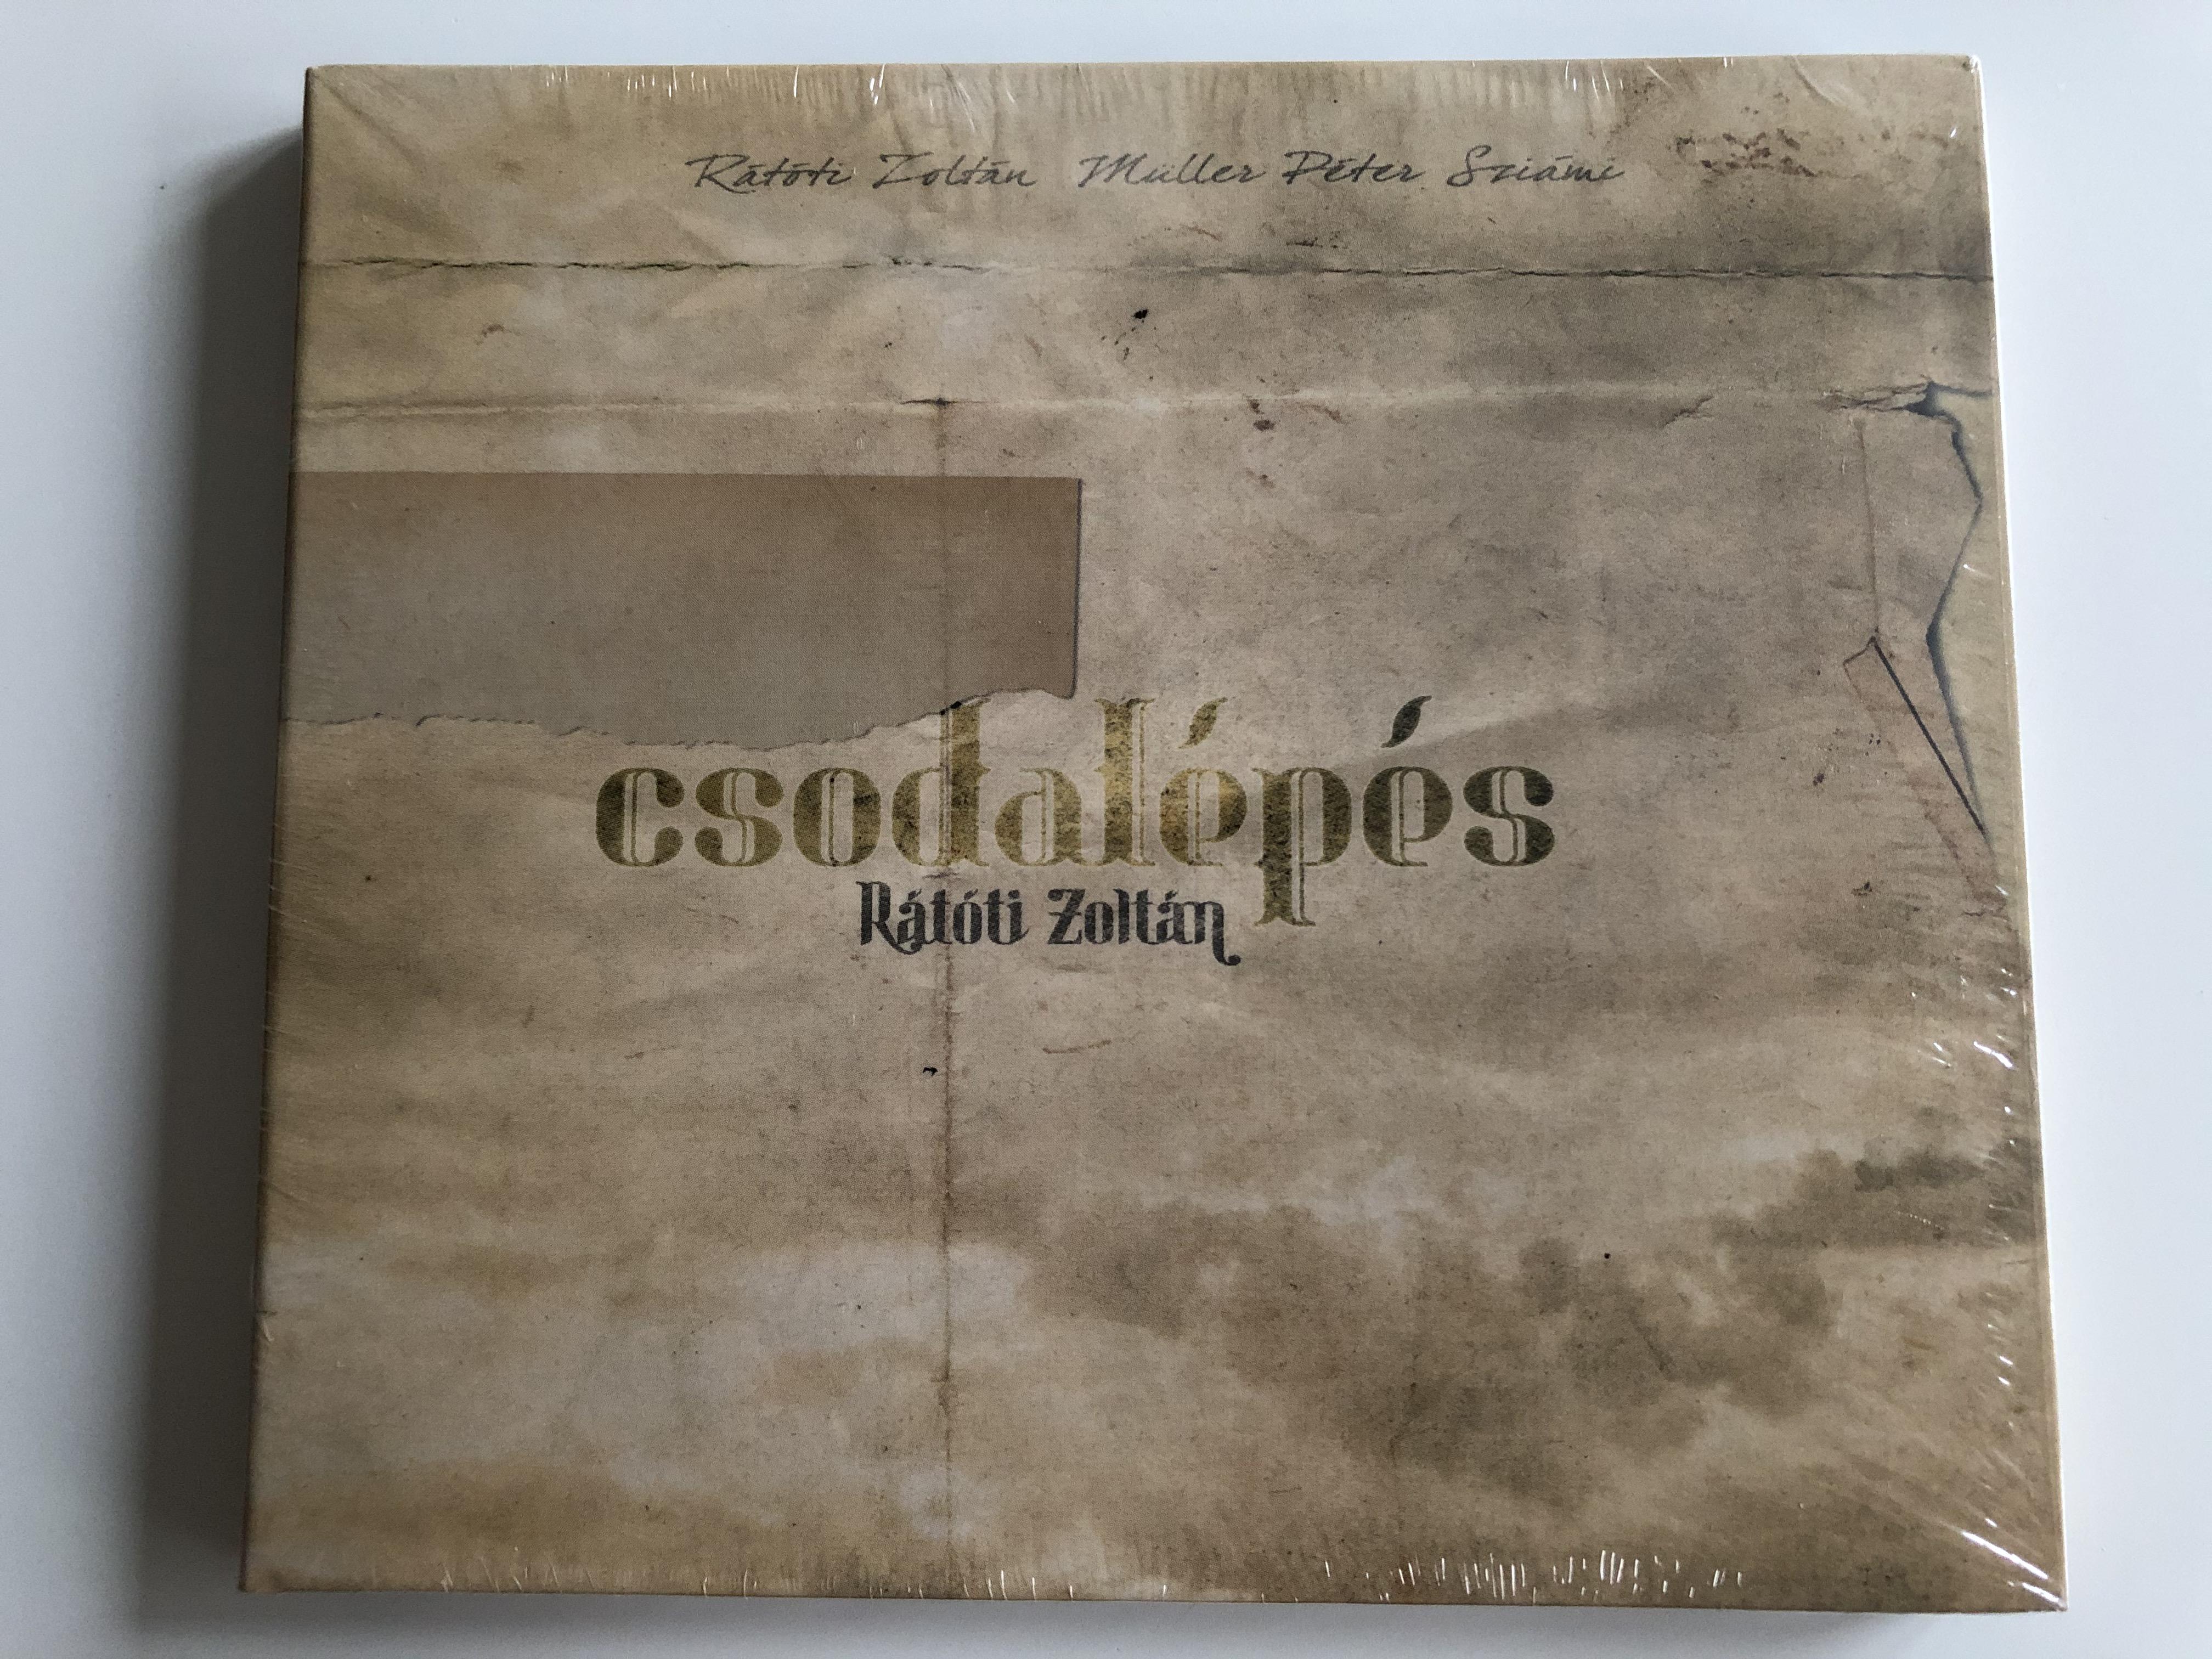 csodal-p-s-r-t-ti-zolt-n-gryllus-audio-cd-2013-gcd-125-2013-1-.jpg